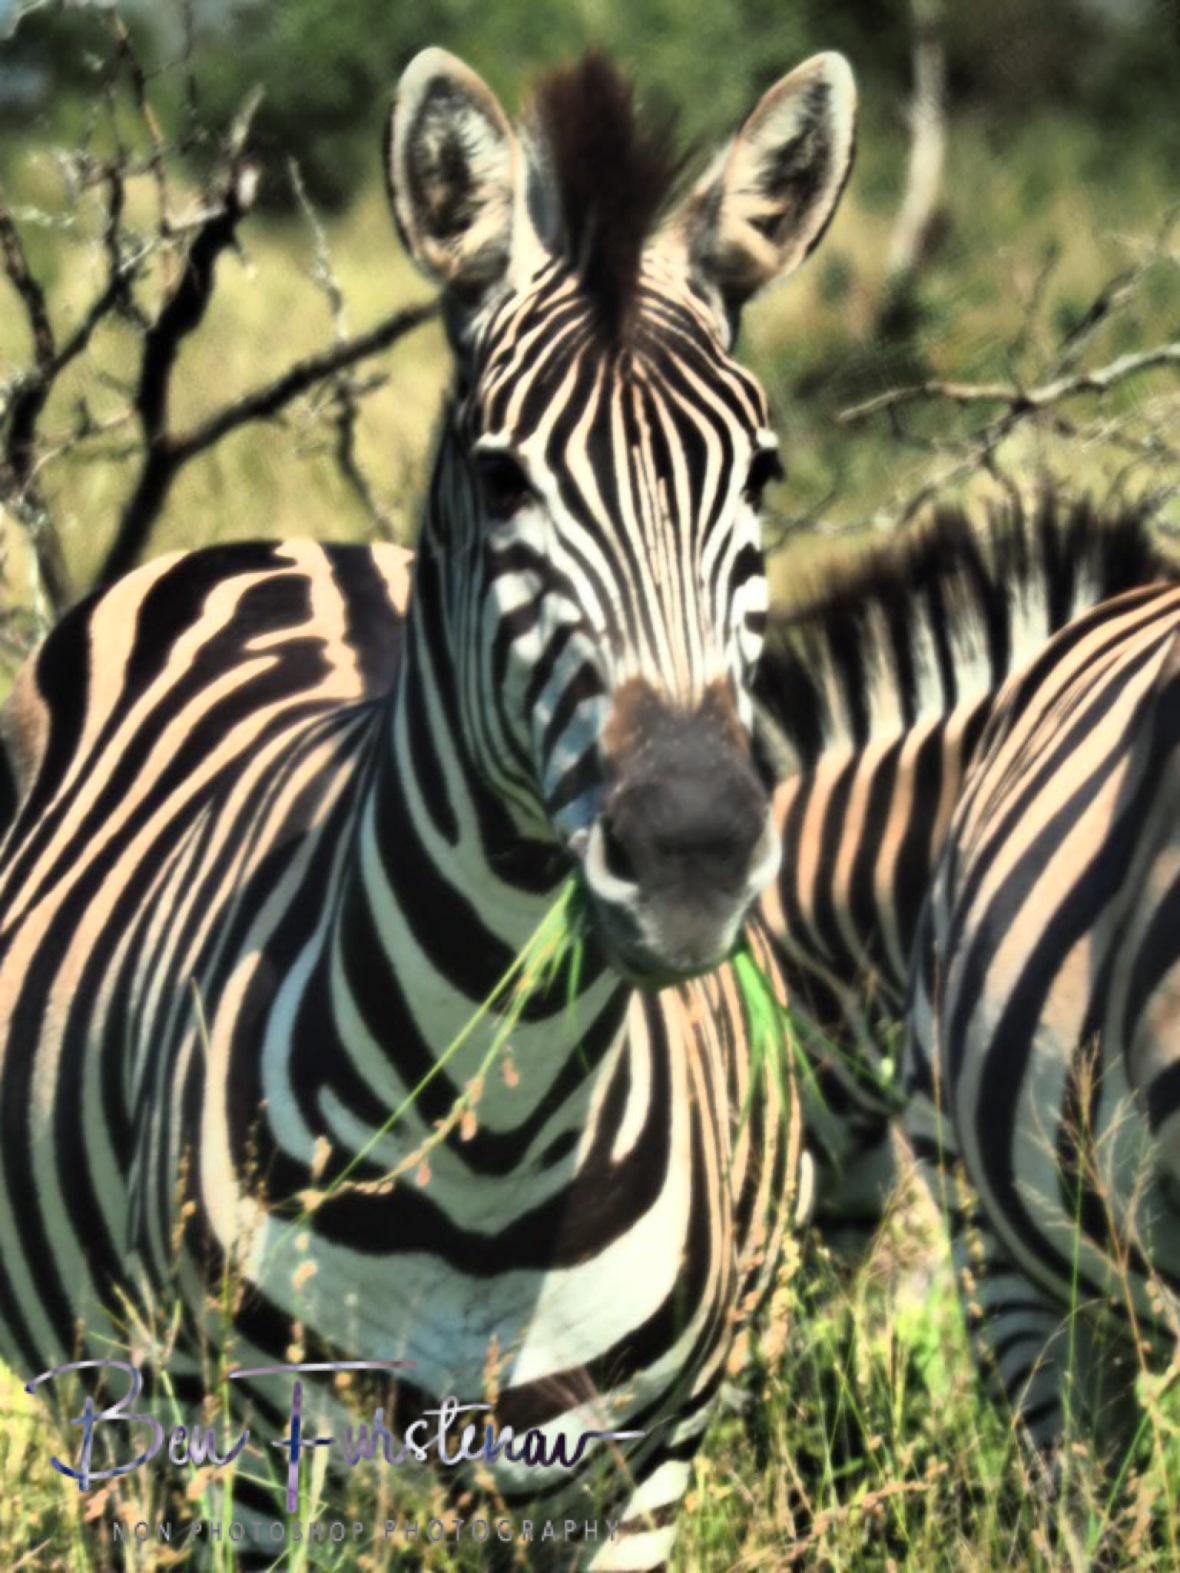 Grazing zebra n disbelief, Kruger National Park